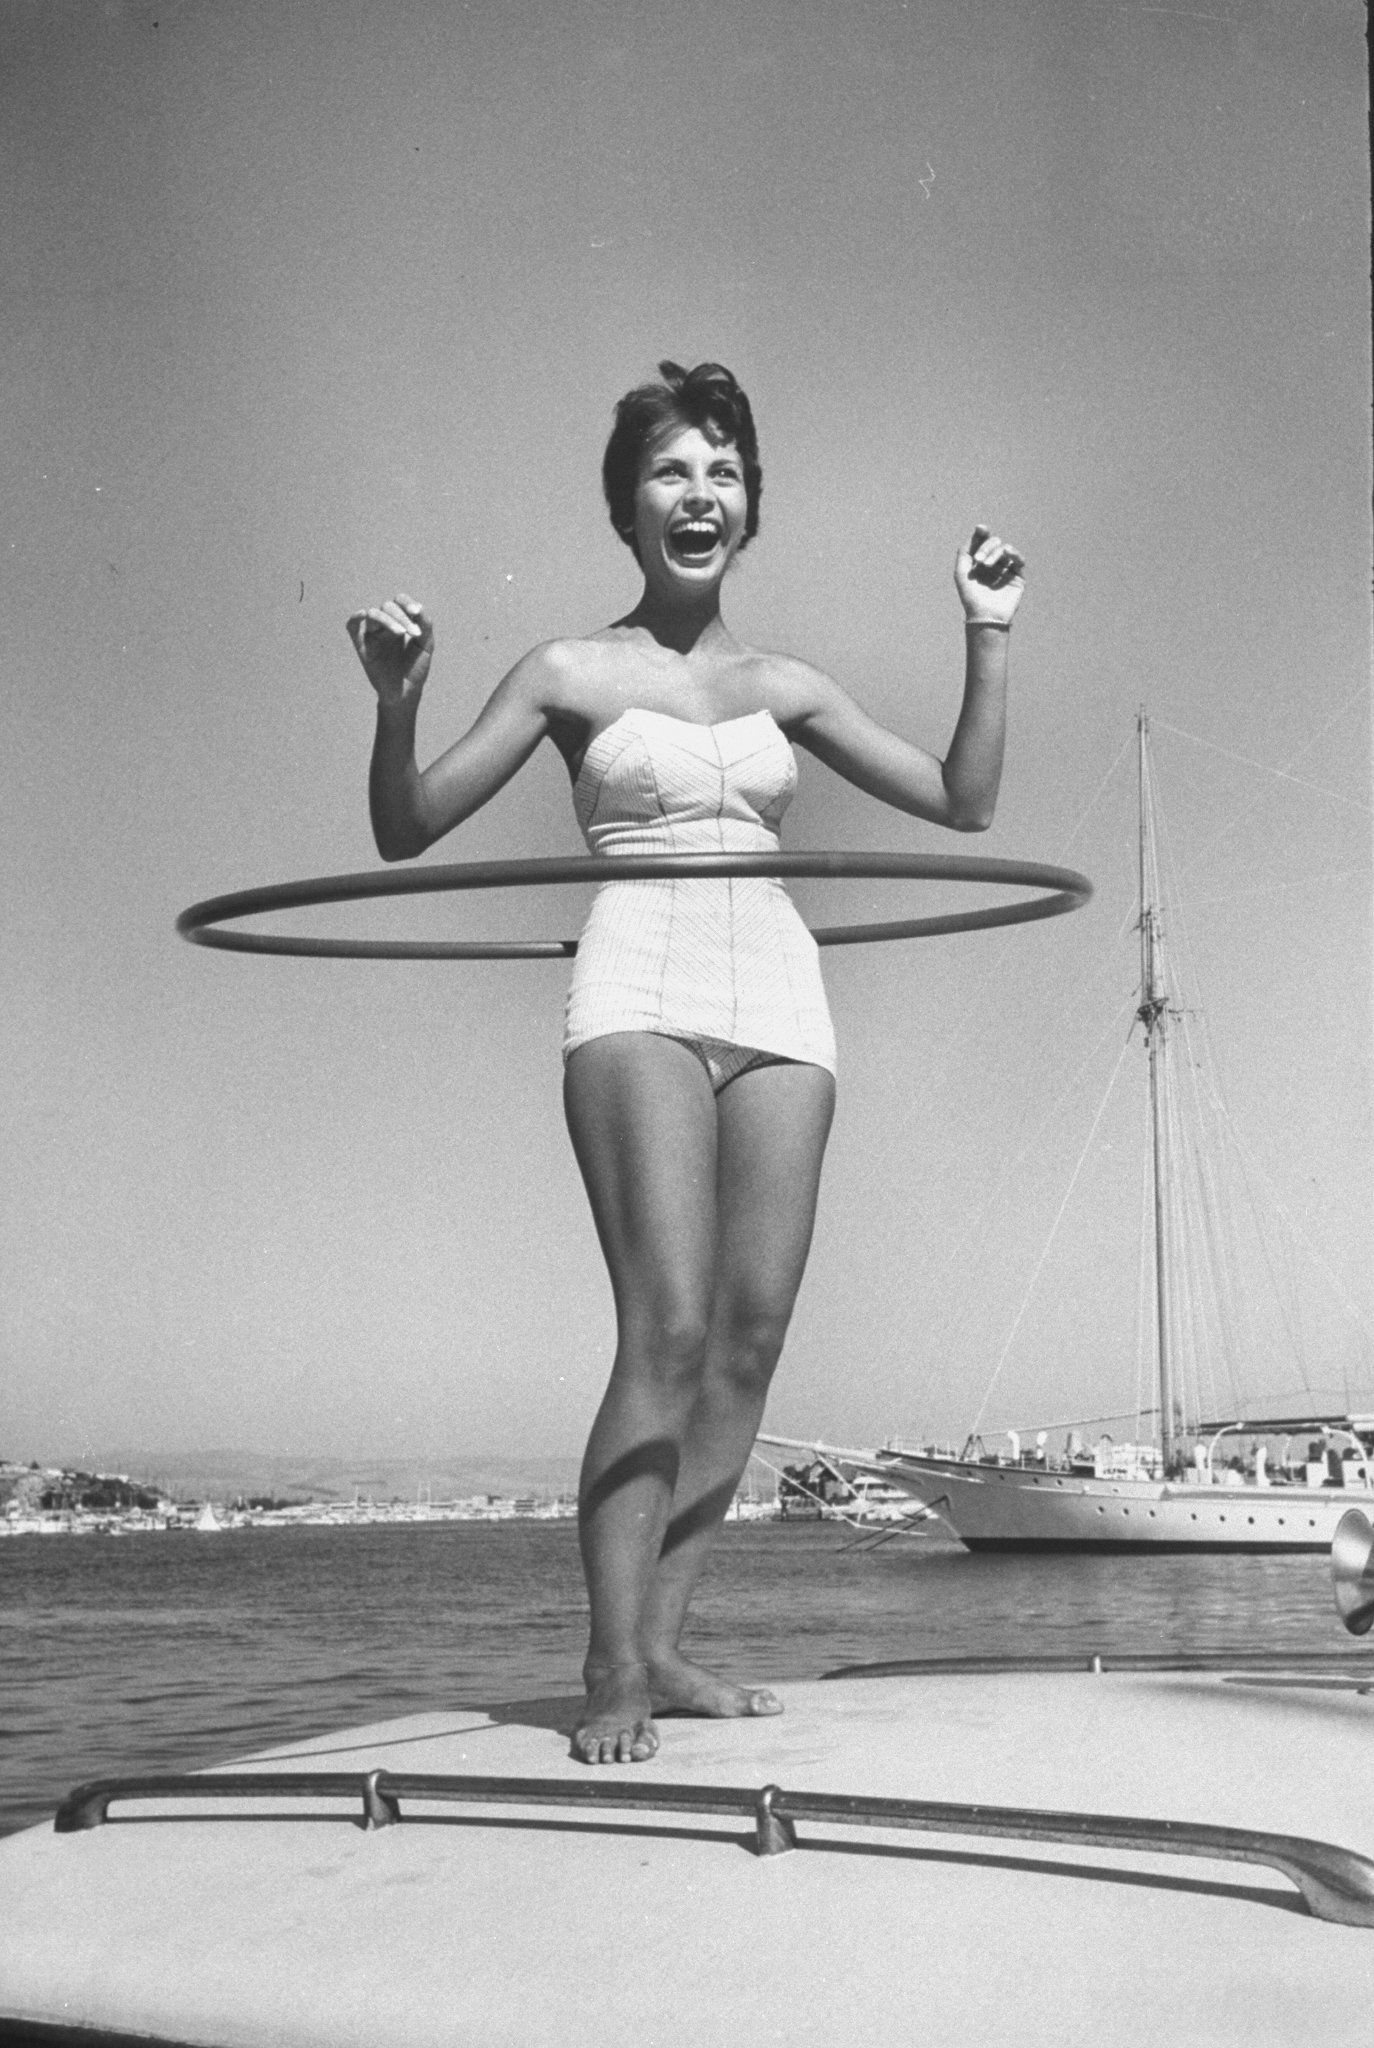 Bonnie Manchester demonstrates a hoop in Newport Beach, California, in 1958.